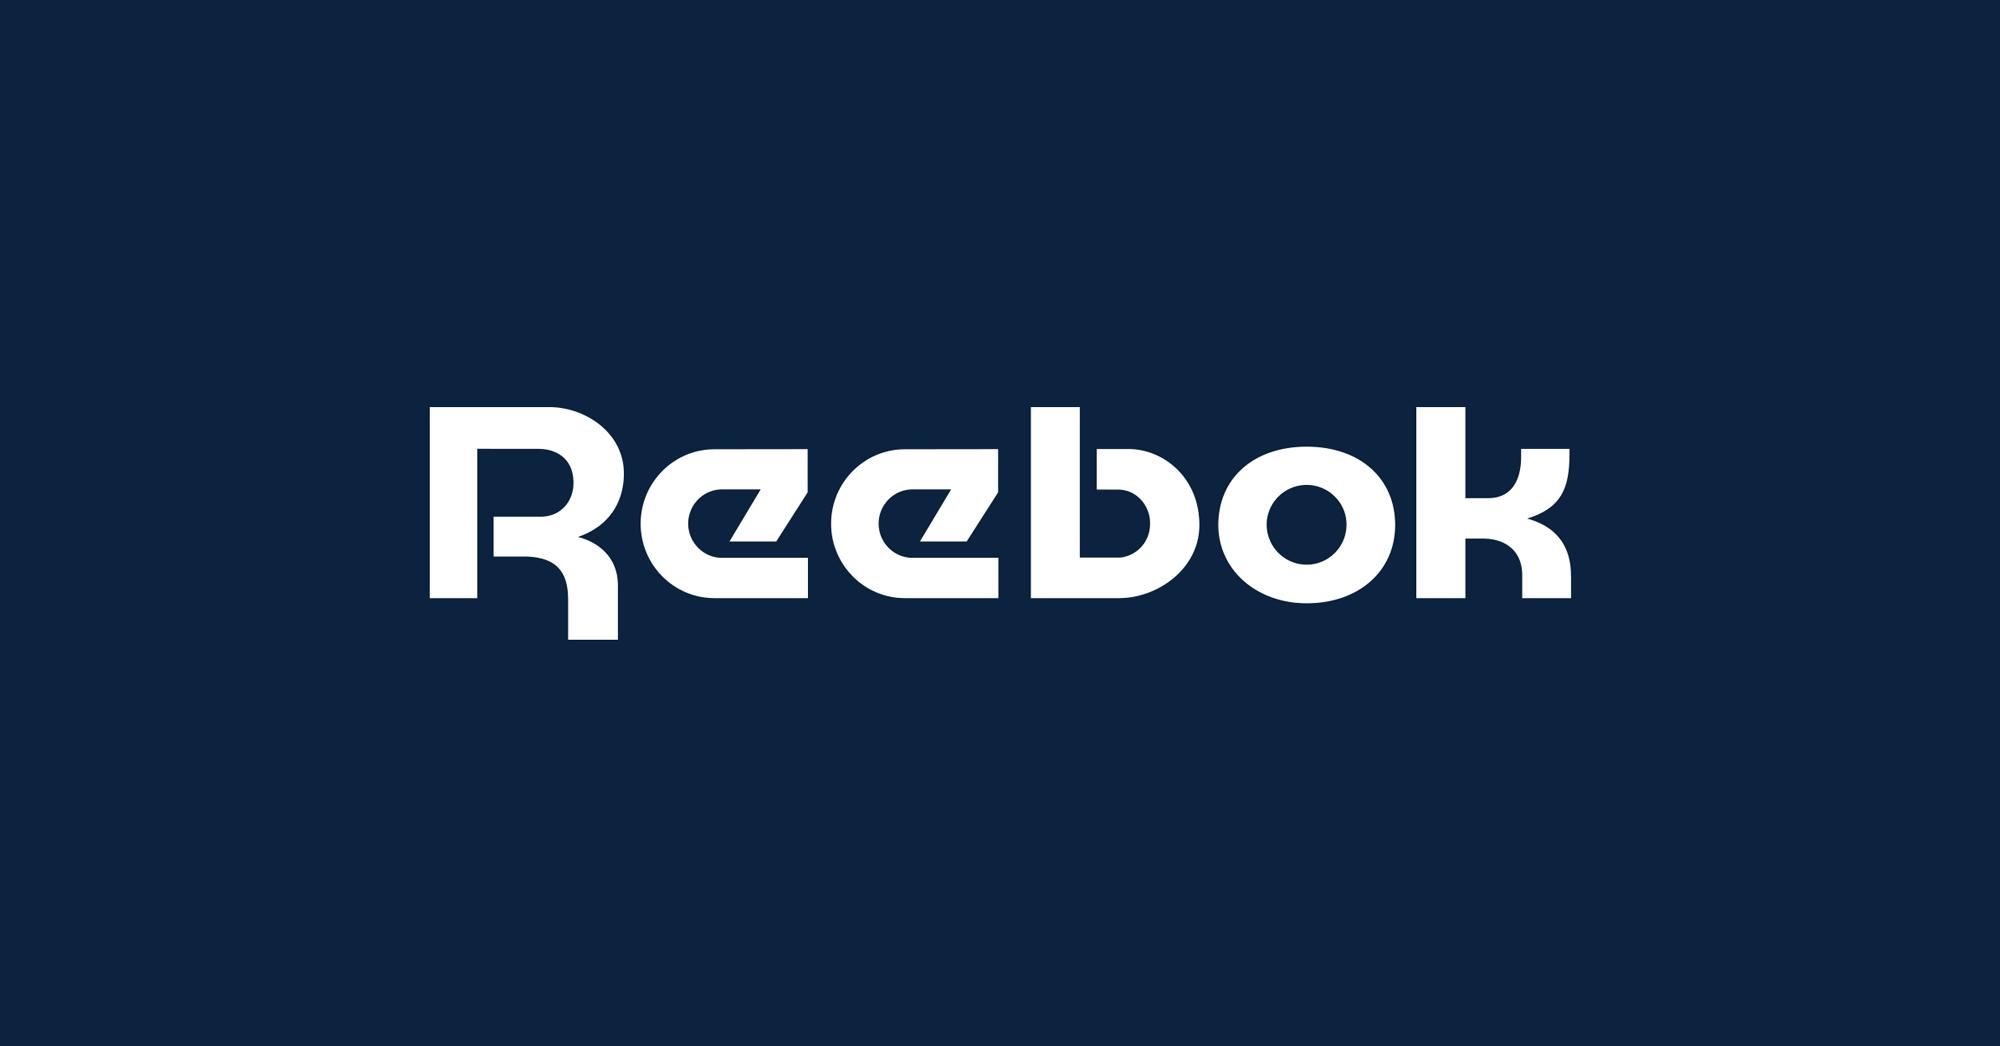 reebok-logotyp-seven-design-blog